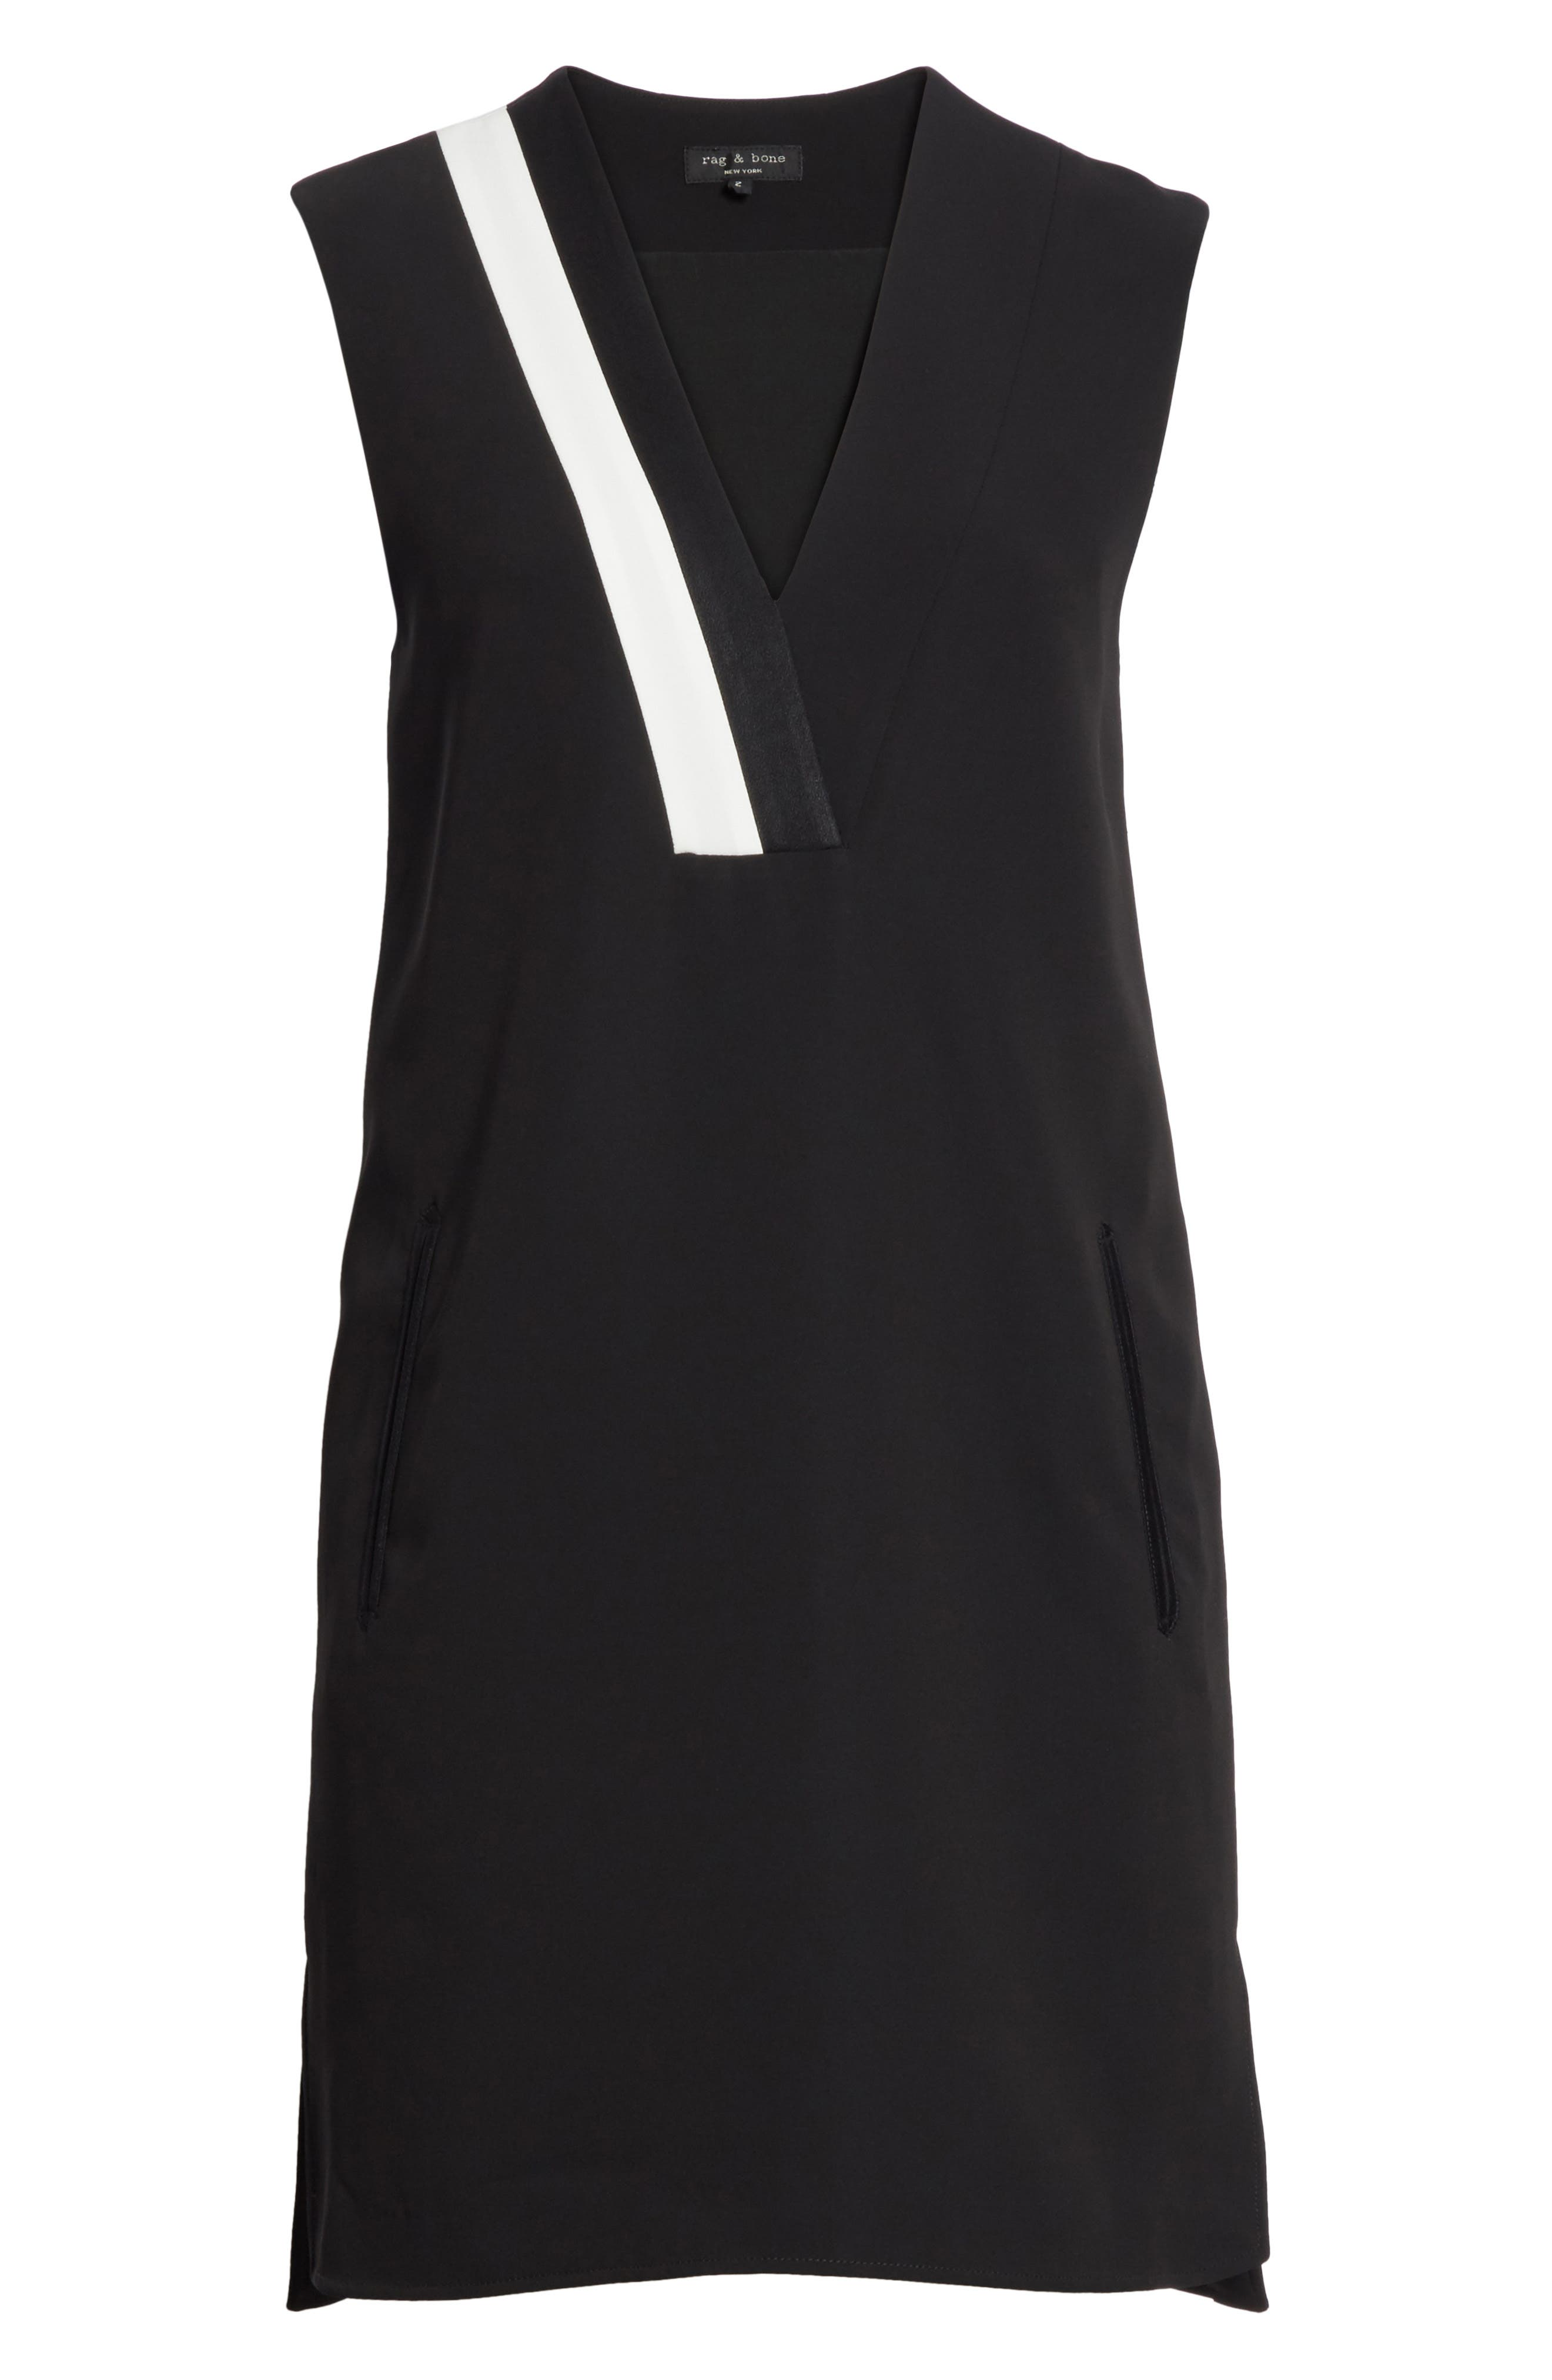 Lodwick Dress,                             Alternate thumbnail 6, color,                             001